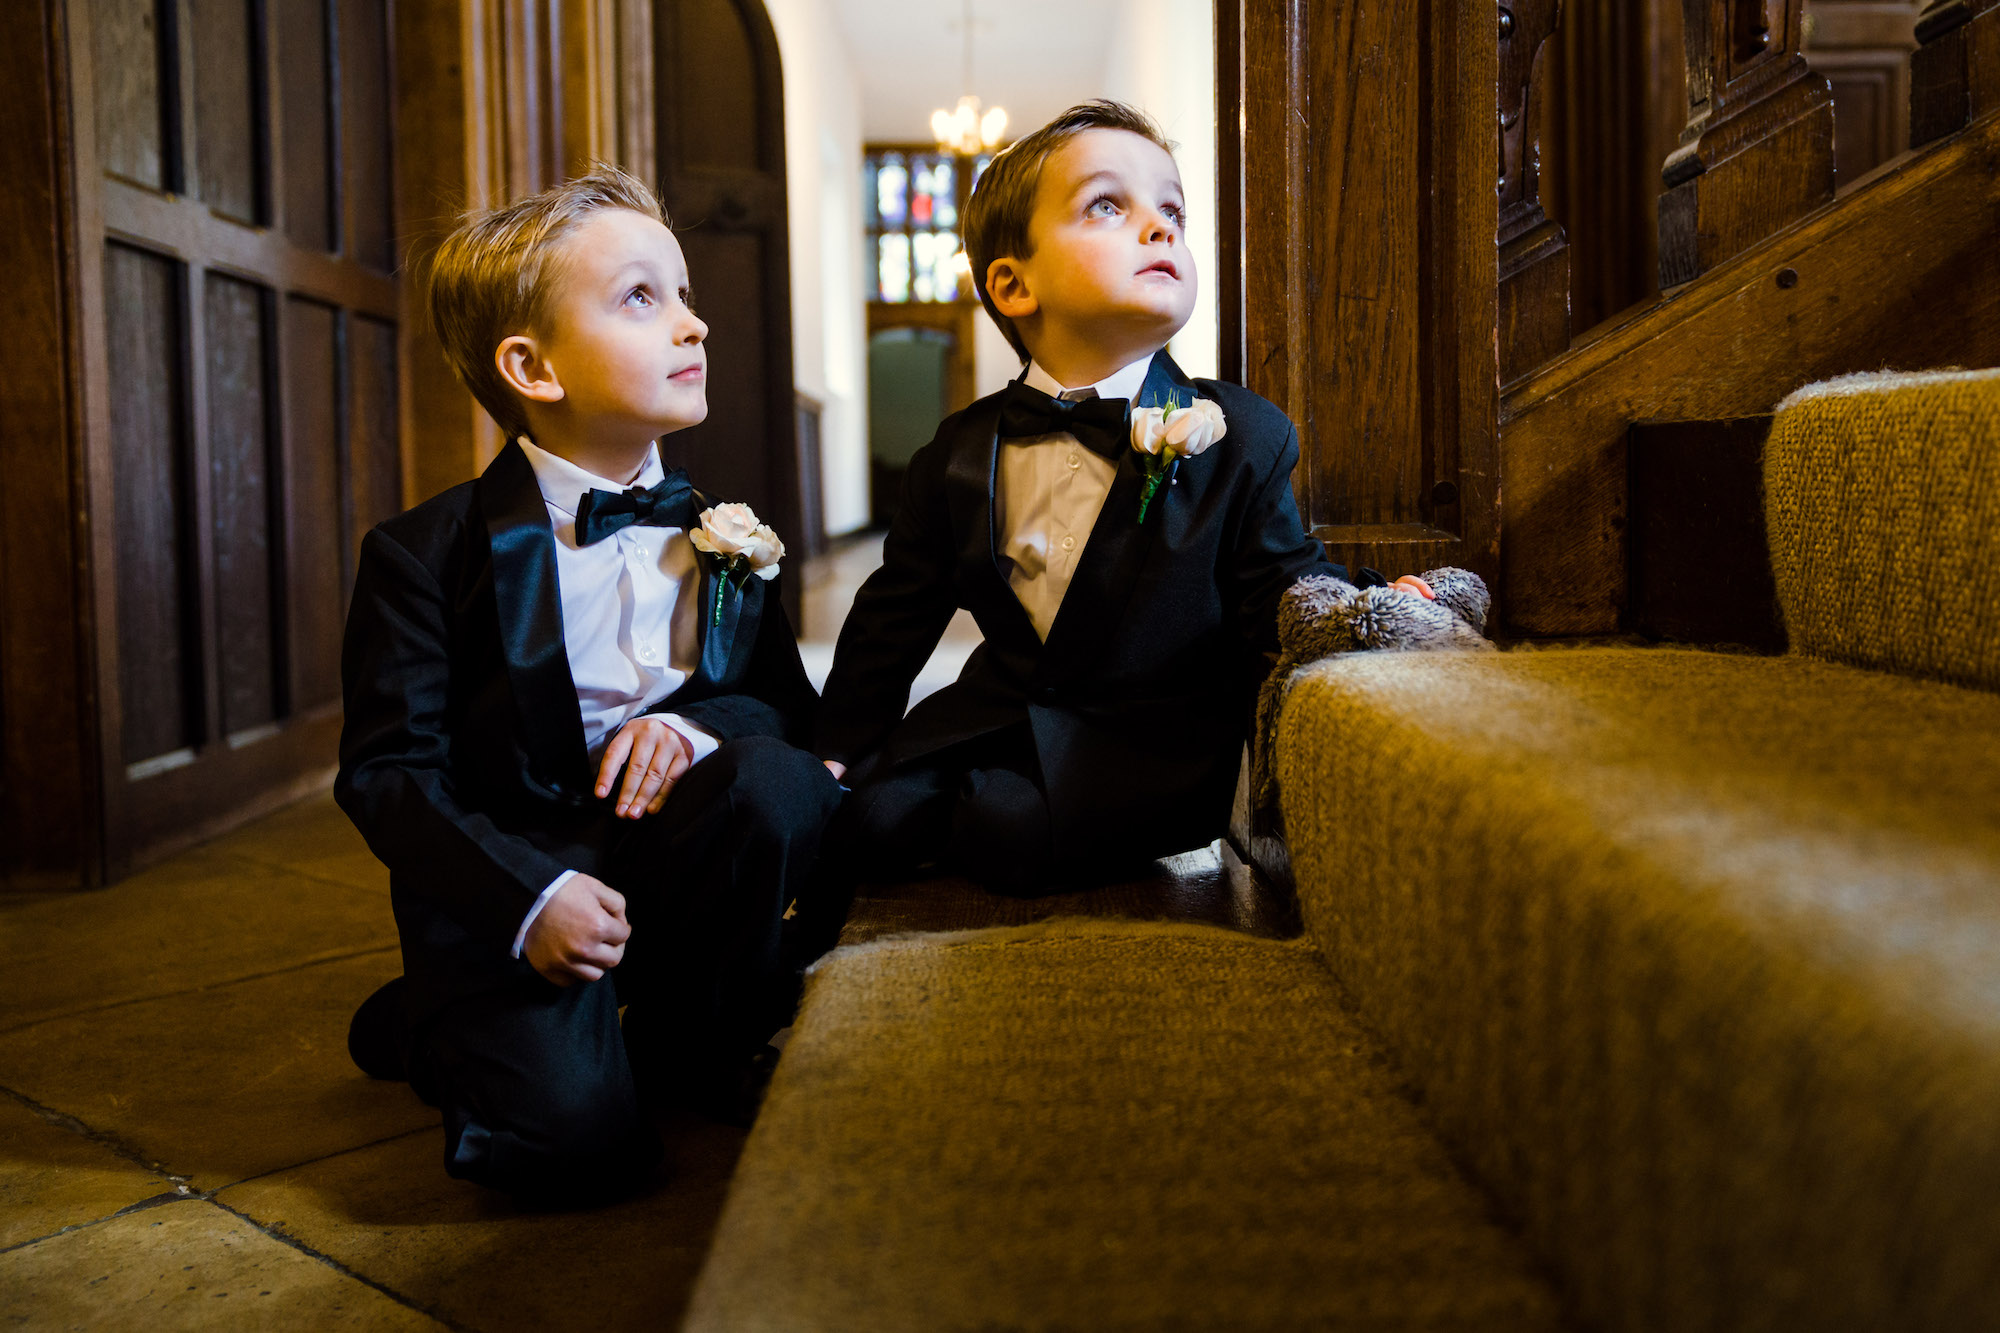 33   Hengrave Hall Wedding   Suffolk Wedding   Lamare London   Luxury Wedding Planner   Jon Mold Photography.jpg